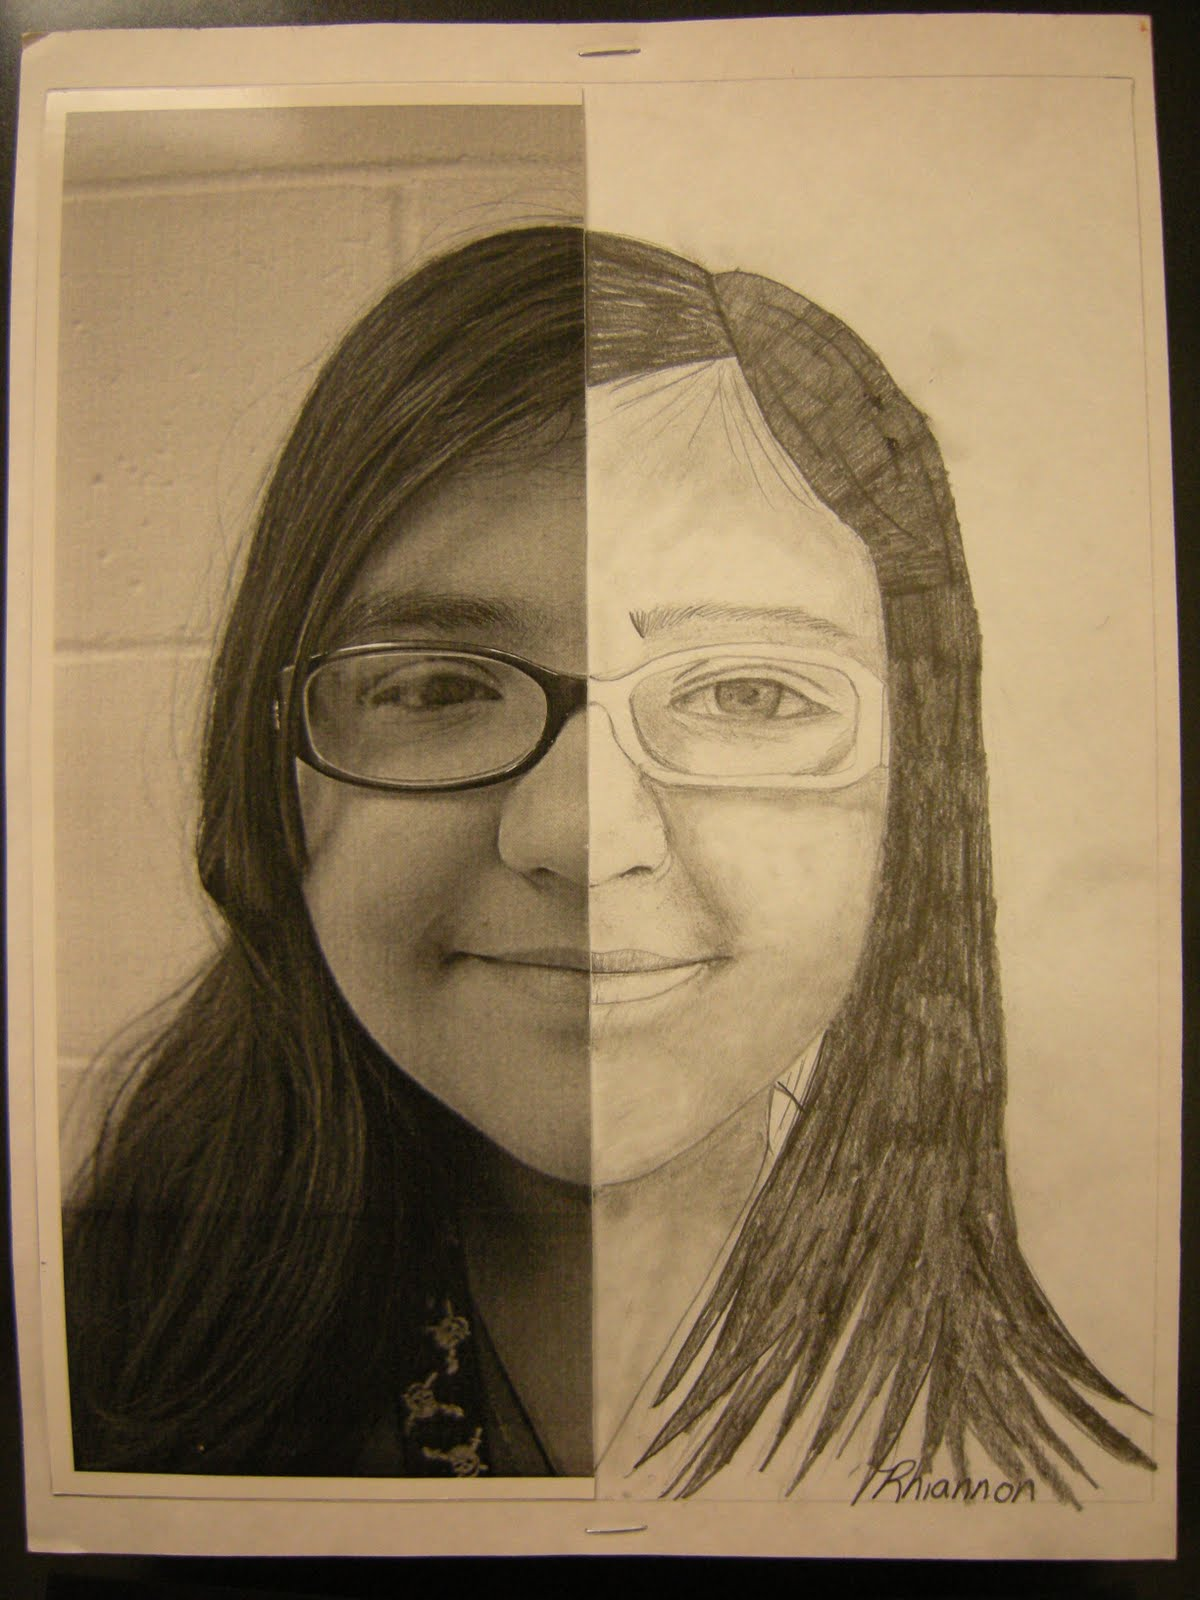 Tart Teaching Art With Attitude Pencil Symmetrical Self